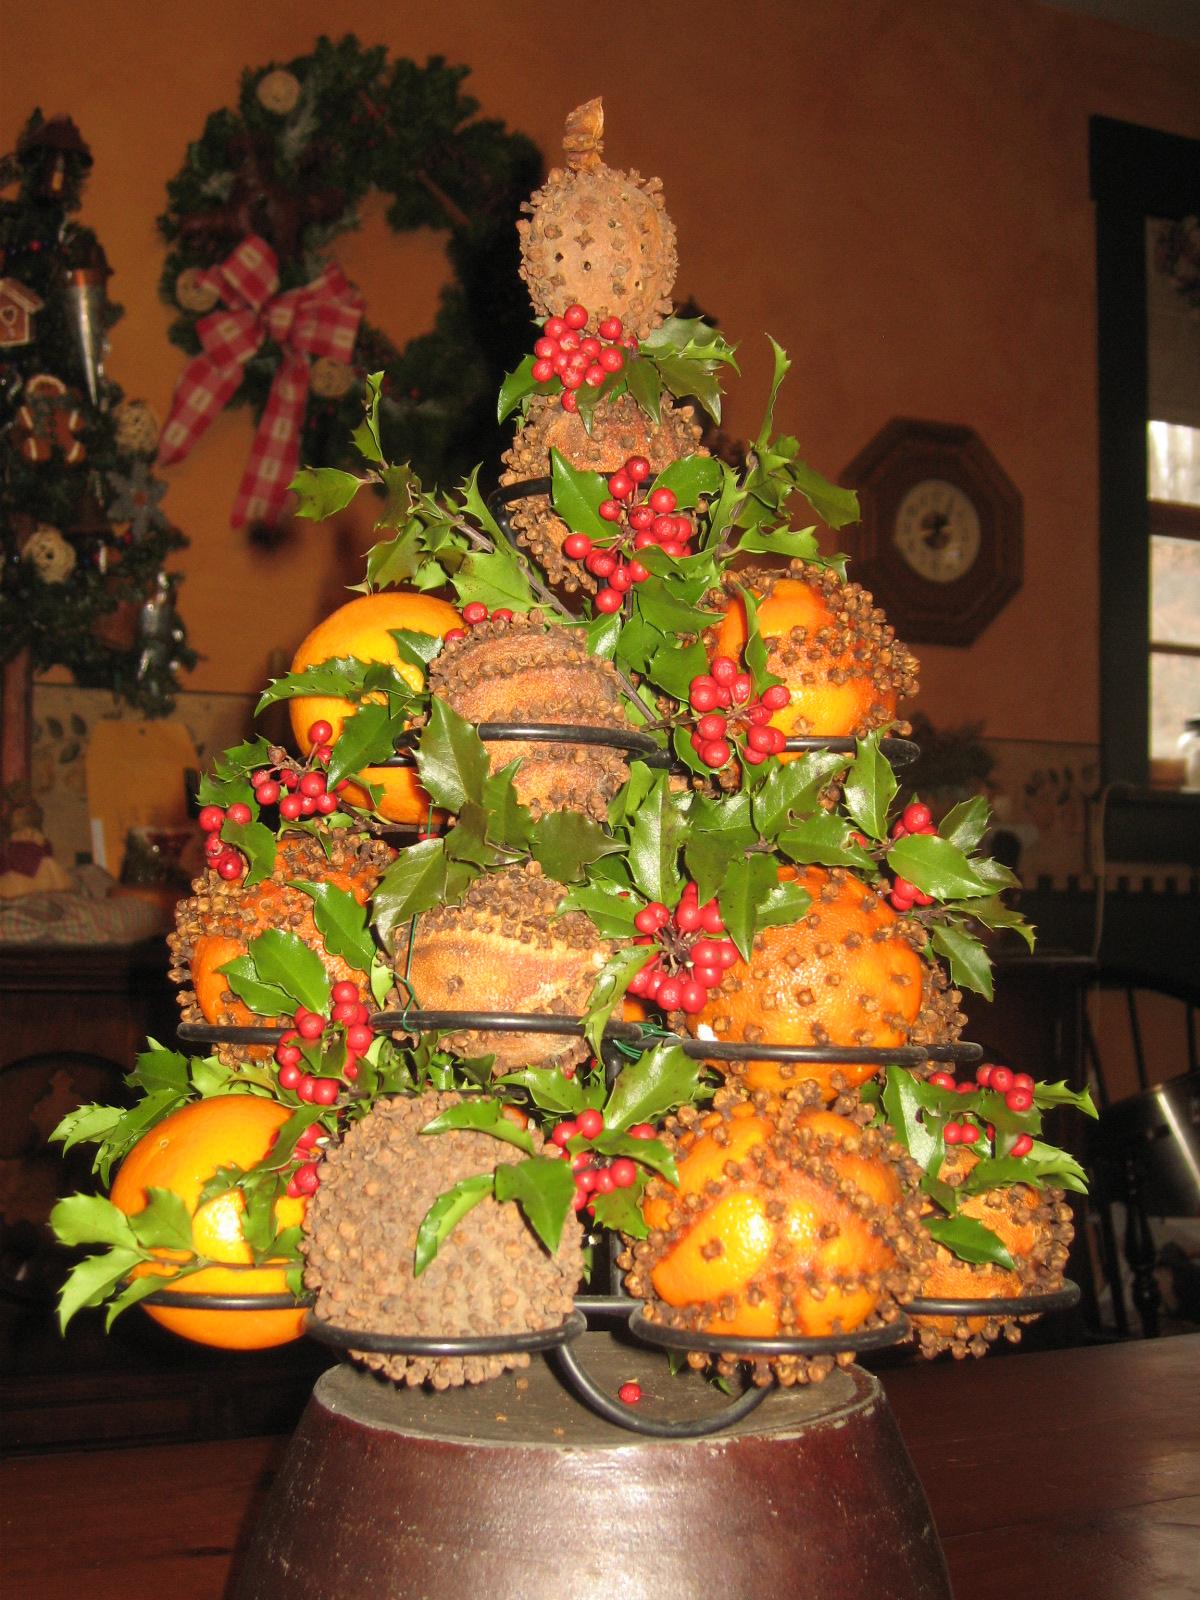 Orange And Lemon Christmas Tree Decorations : Diy orange pomander tree the woodwife s journal